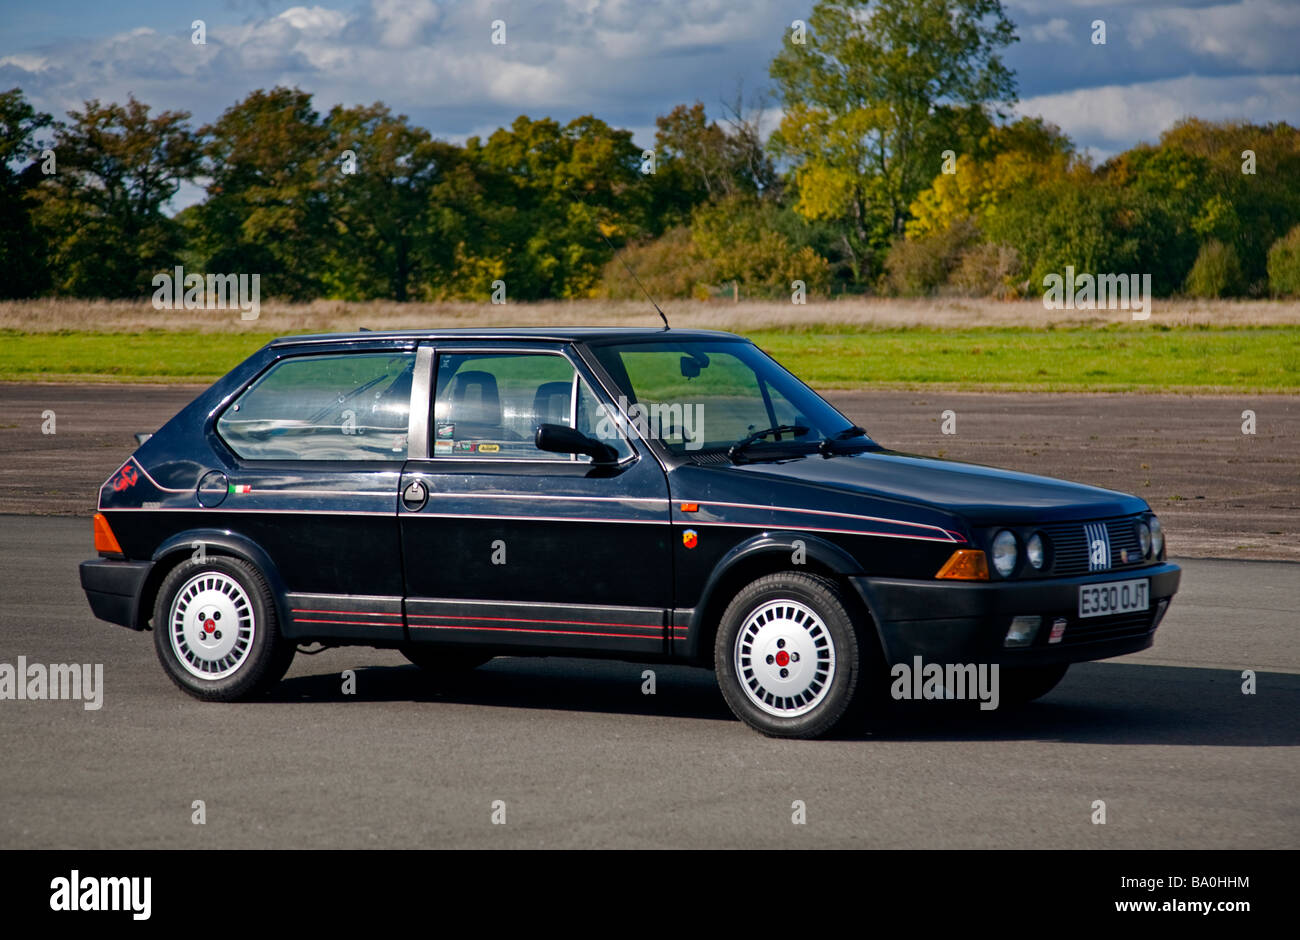 Black Fiat Strada Abarth Mk 2 (130TC) 1988 - Stock Image